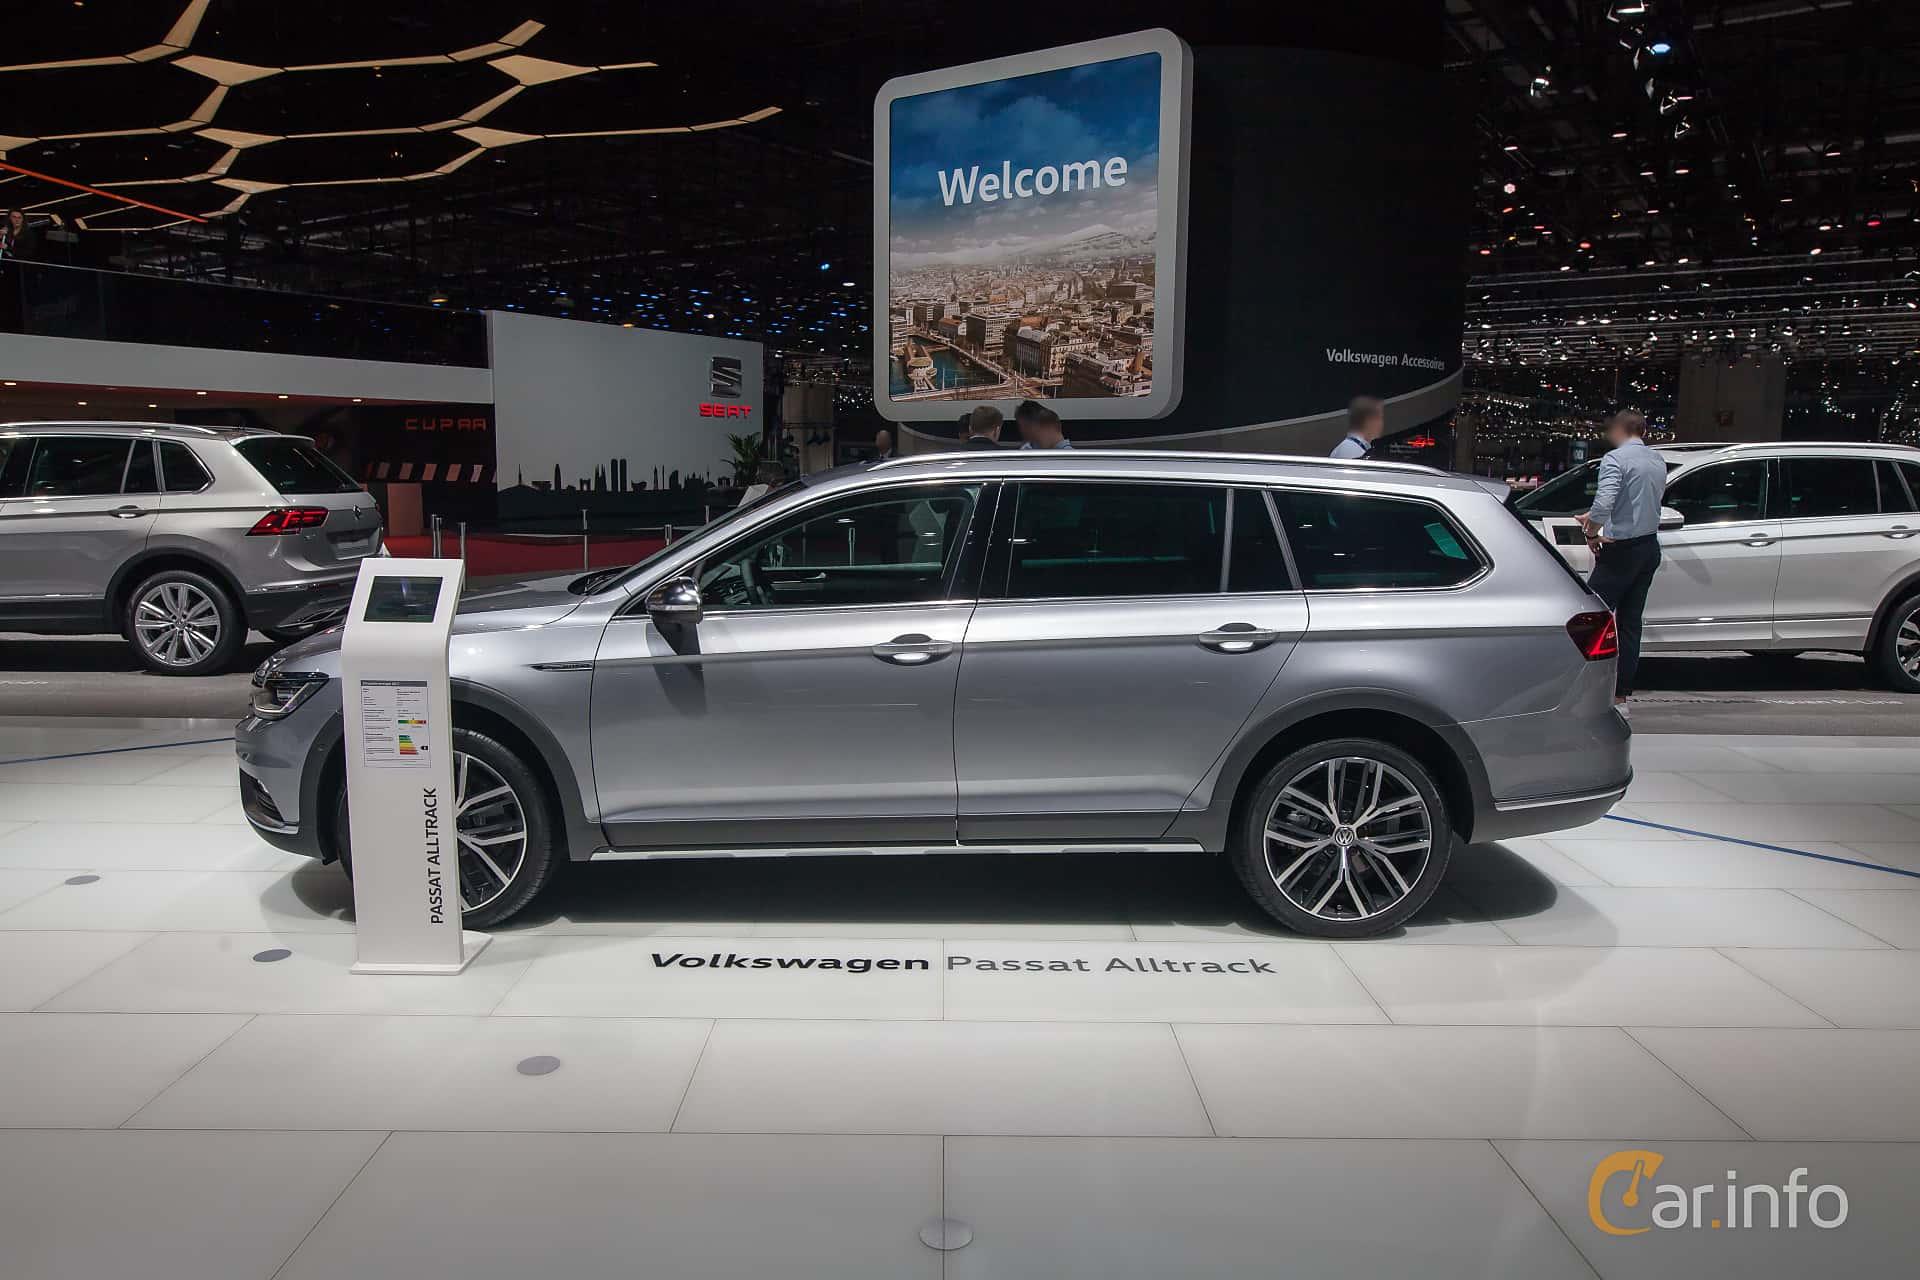 Volkswagen Passat Alltrack 2 0 Tdi Scr Bluemotion 4motion